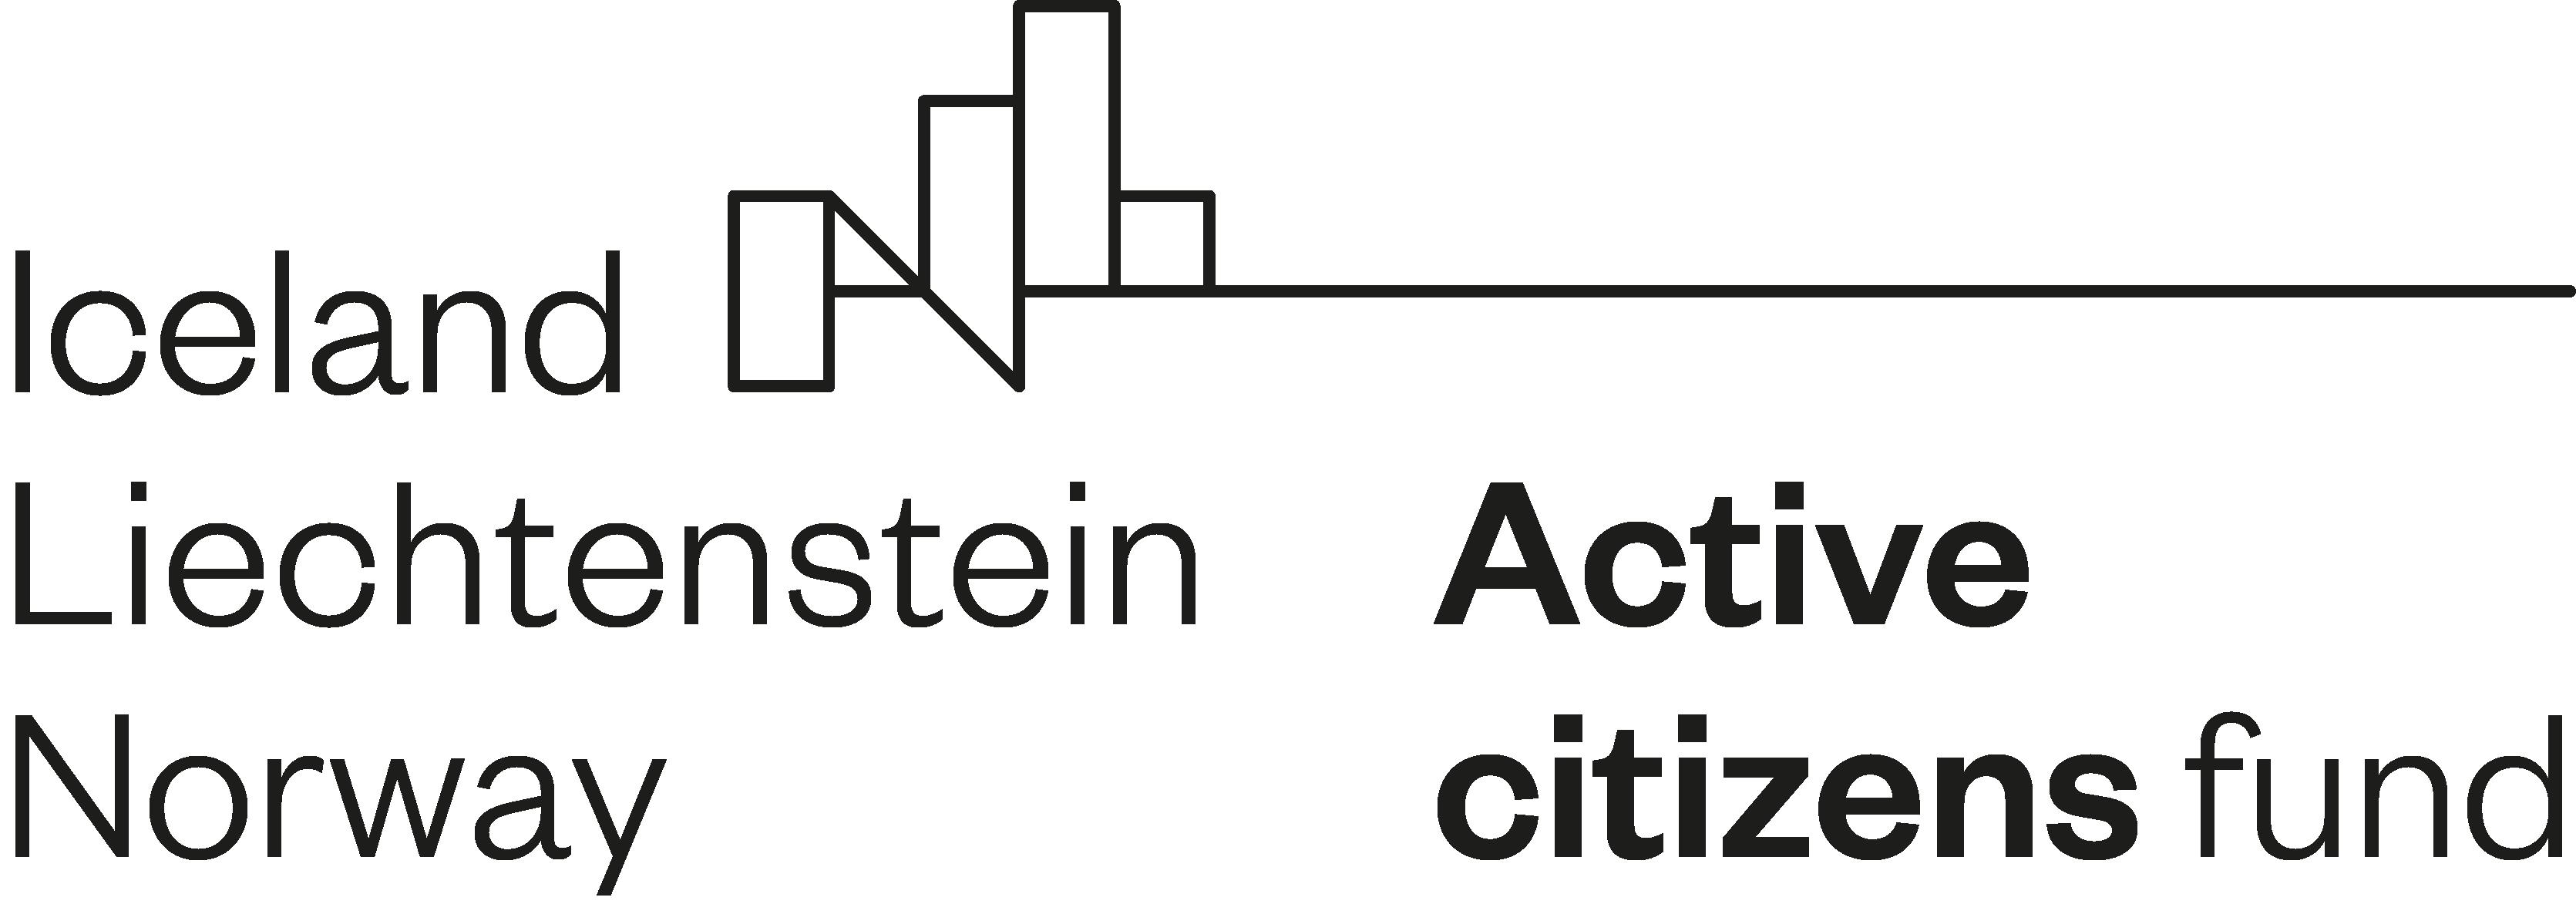 active-citizens-fund4x